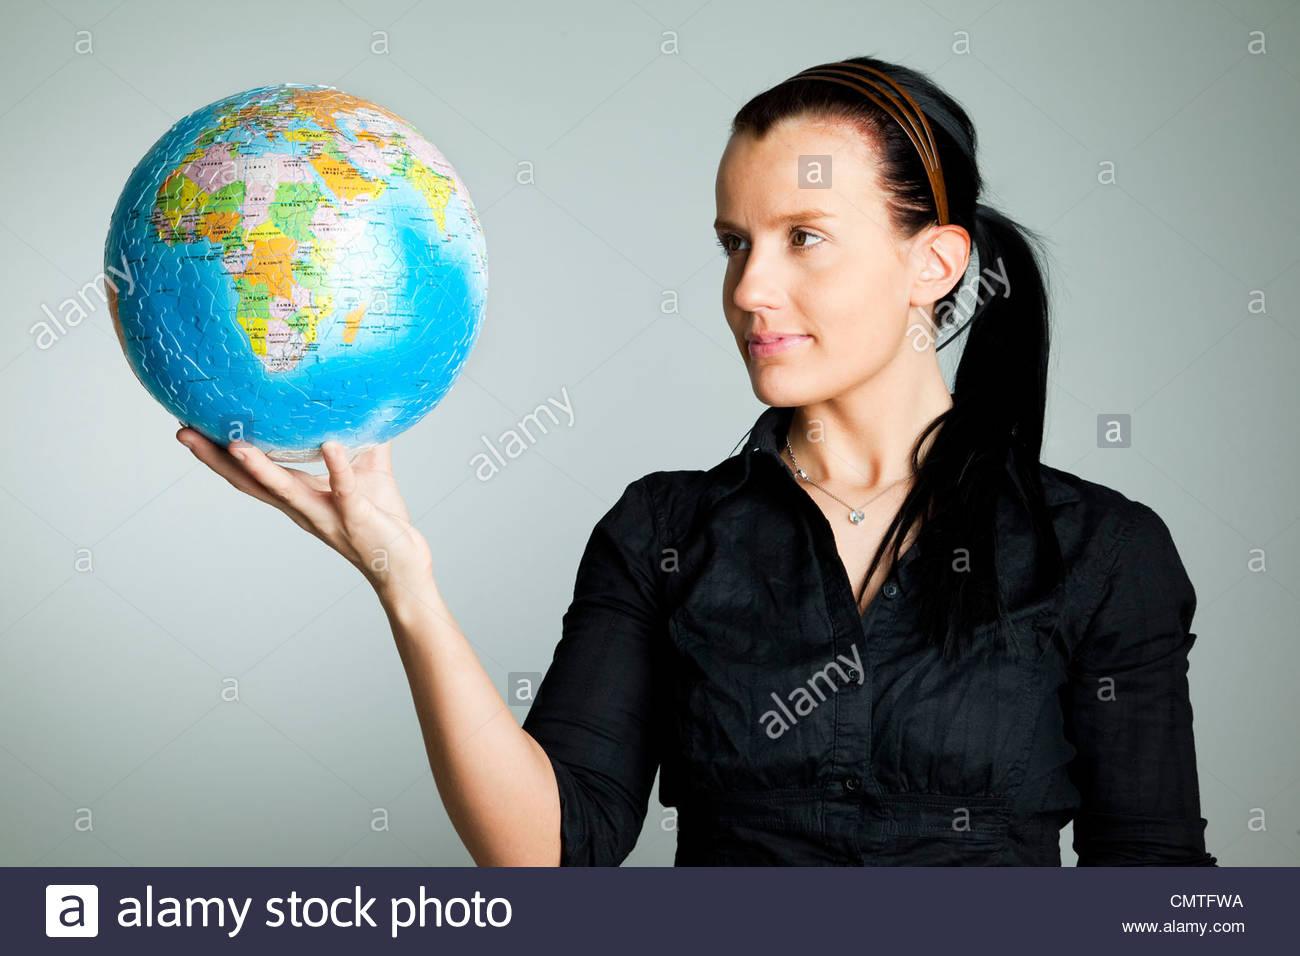 Femme debout avec globe terrestre dans sa main Photo Stock